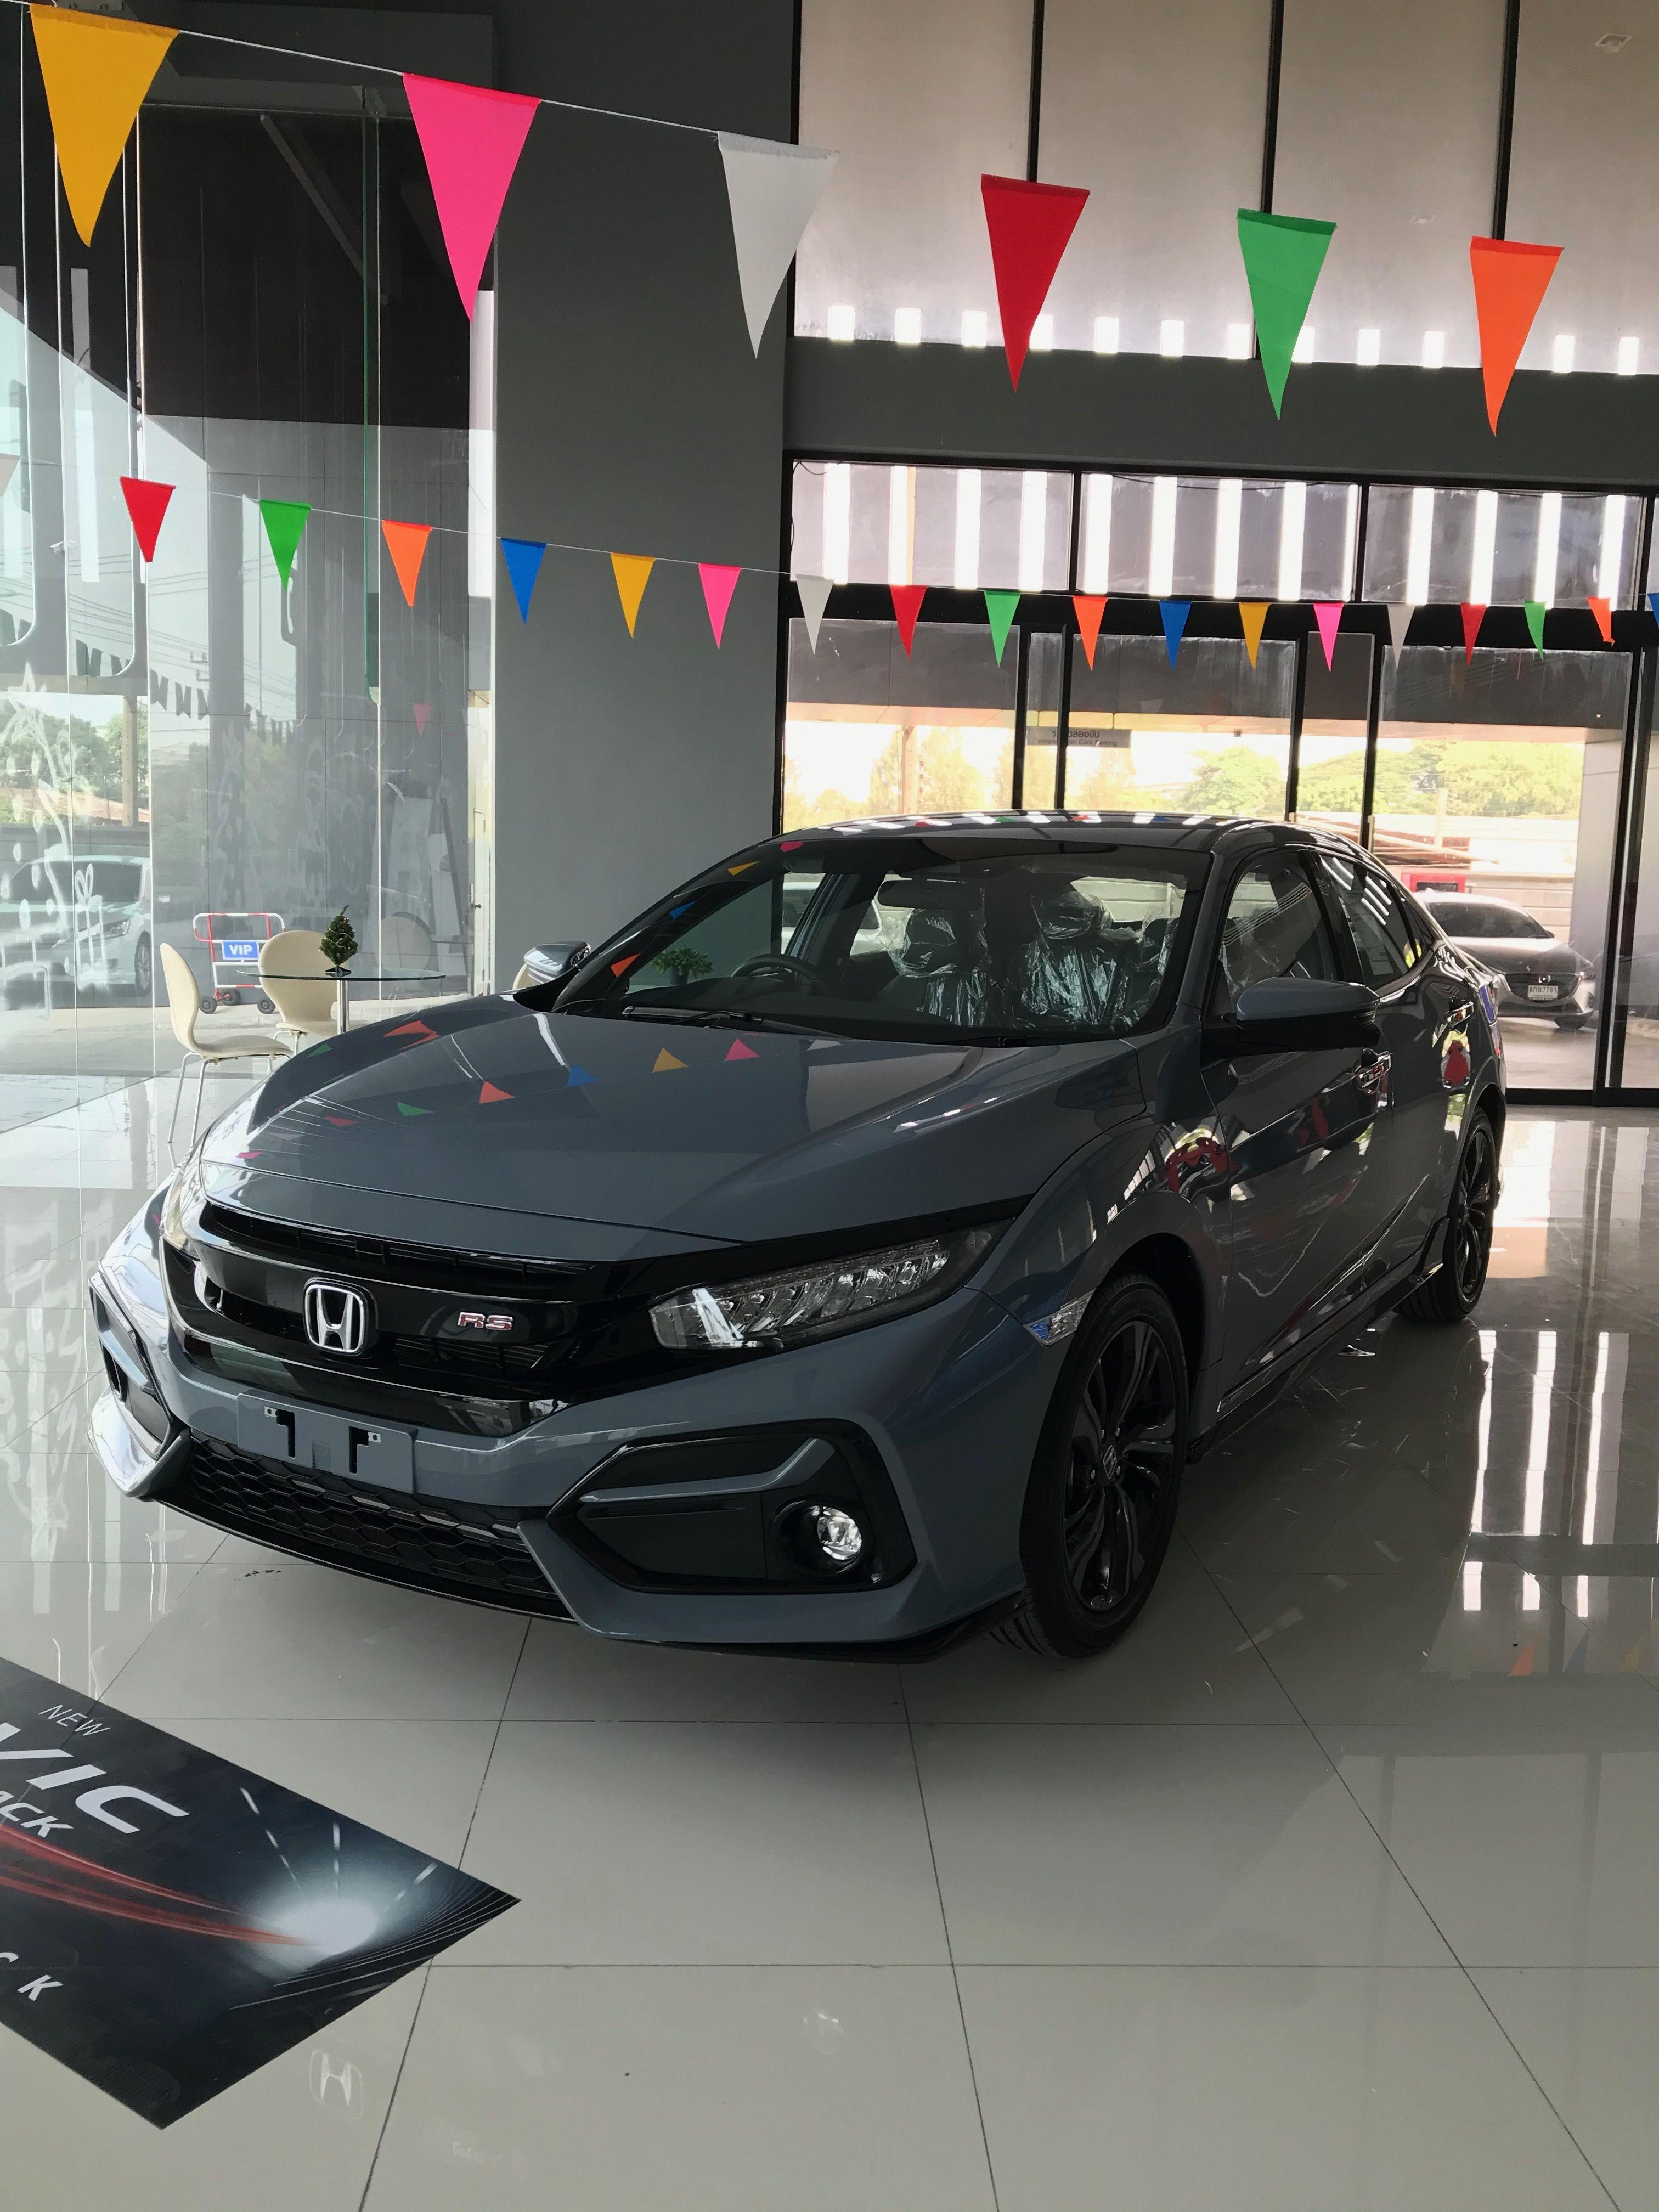 Honda Civic Hatchback Rs 28 Lakh Real Life Review In 2021 Honda Civic Civic Hatchback Honda Civic Hatch